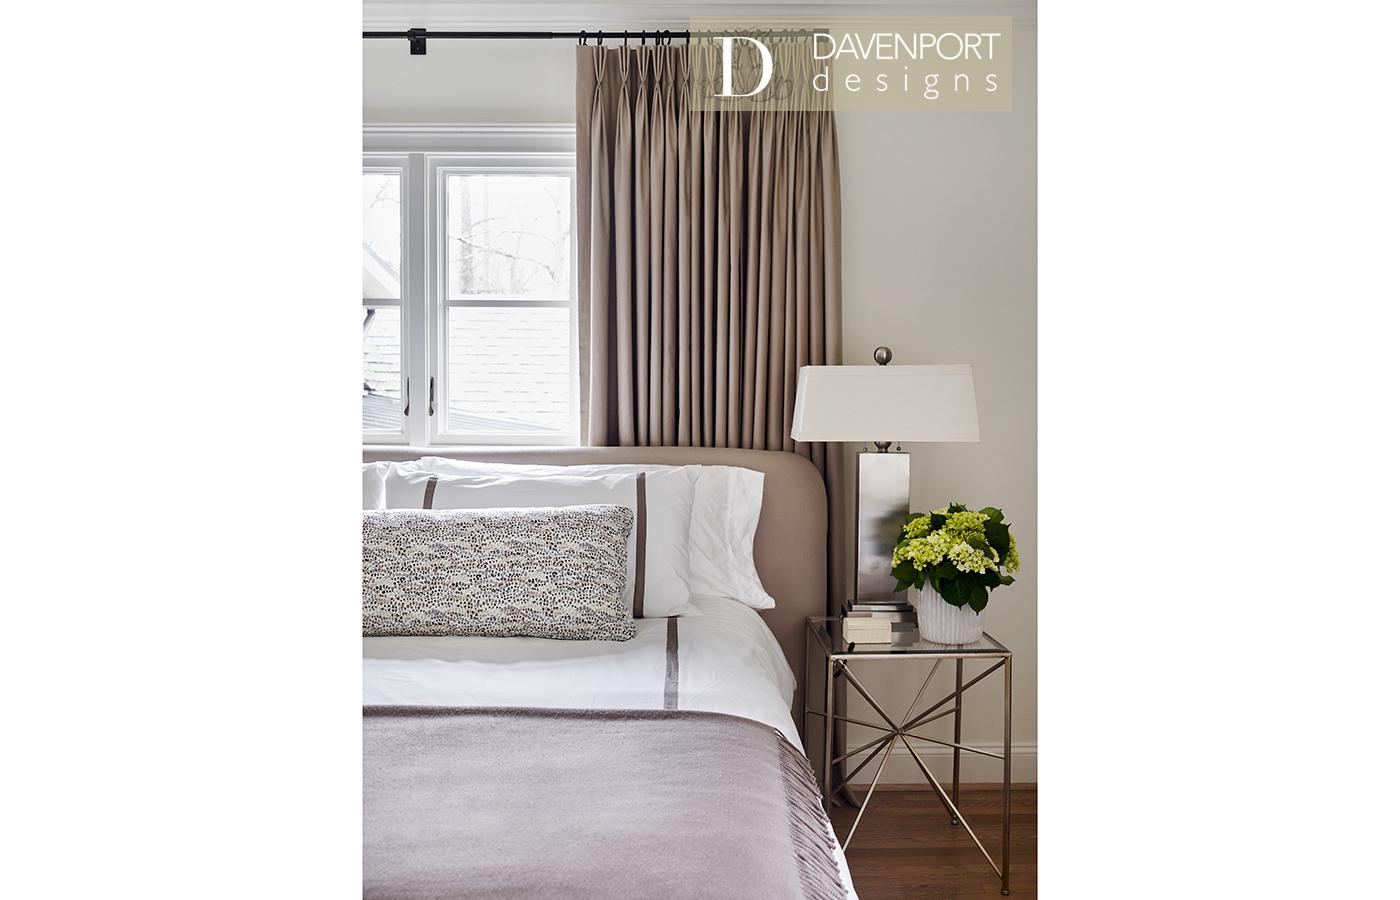 bedroom_1_170221_113_web.jpg